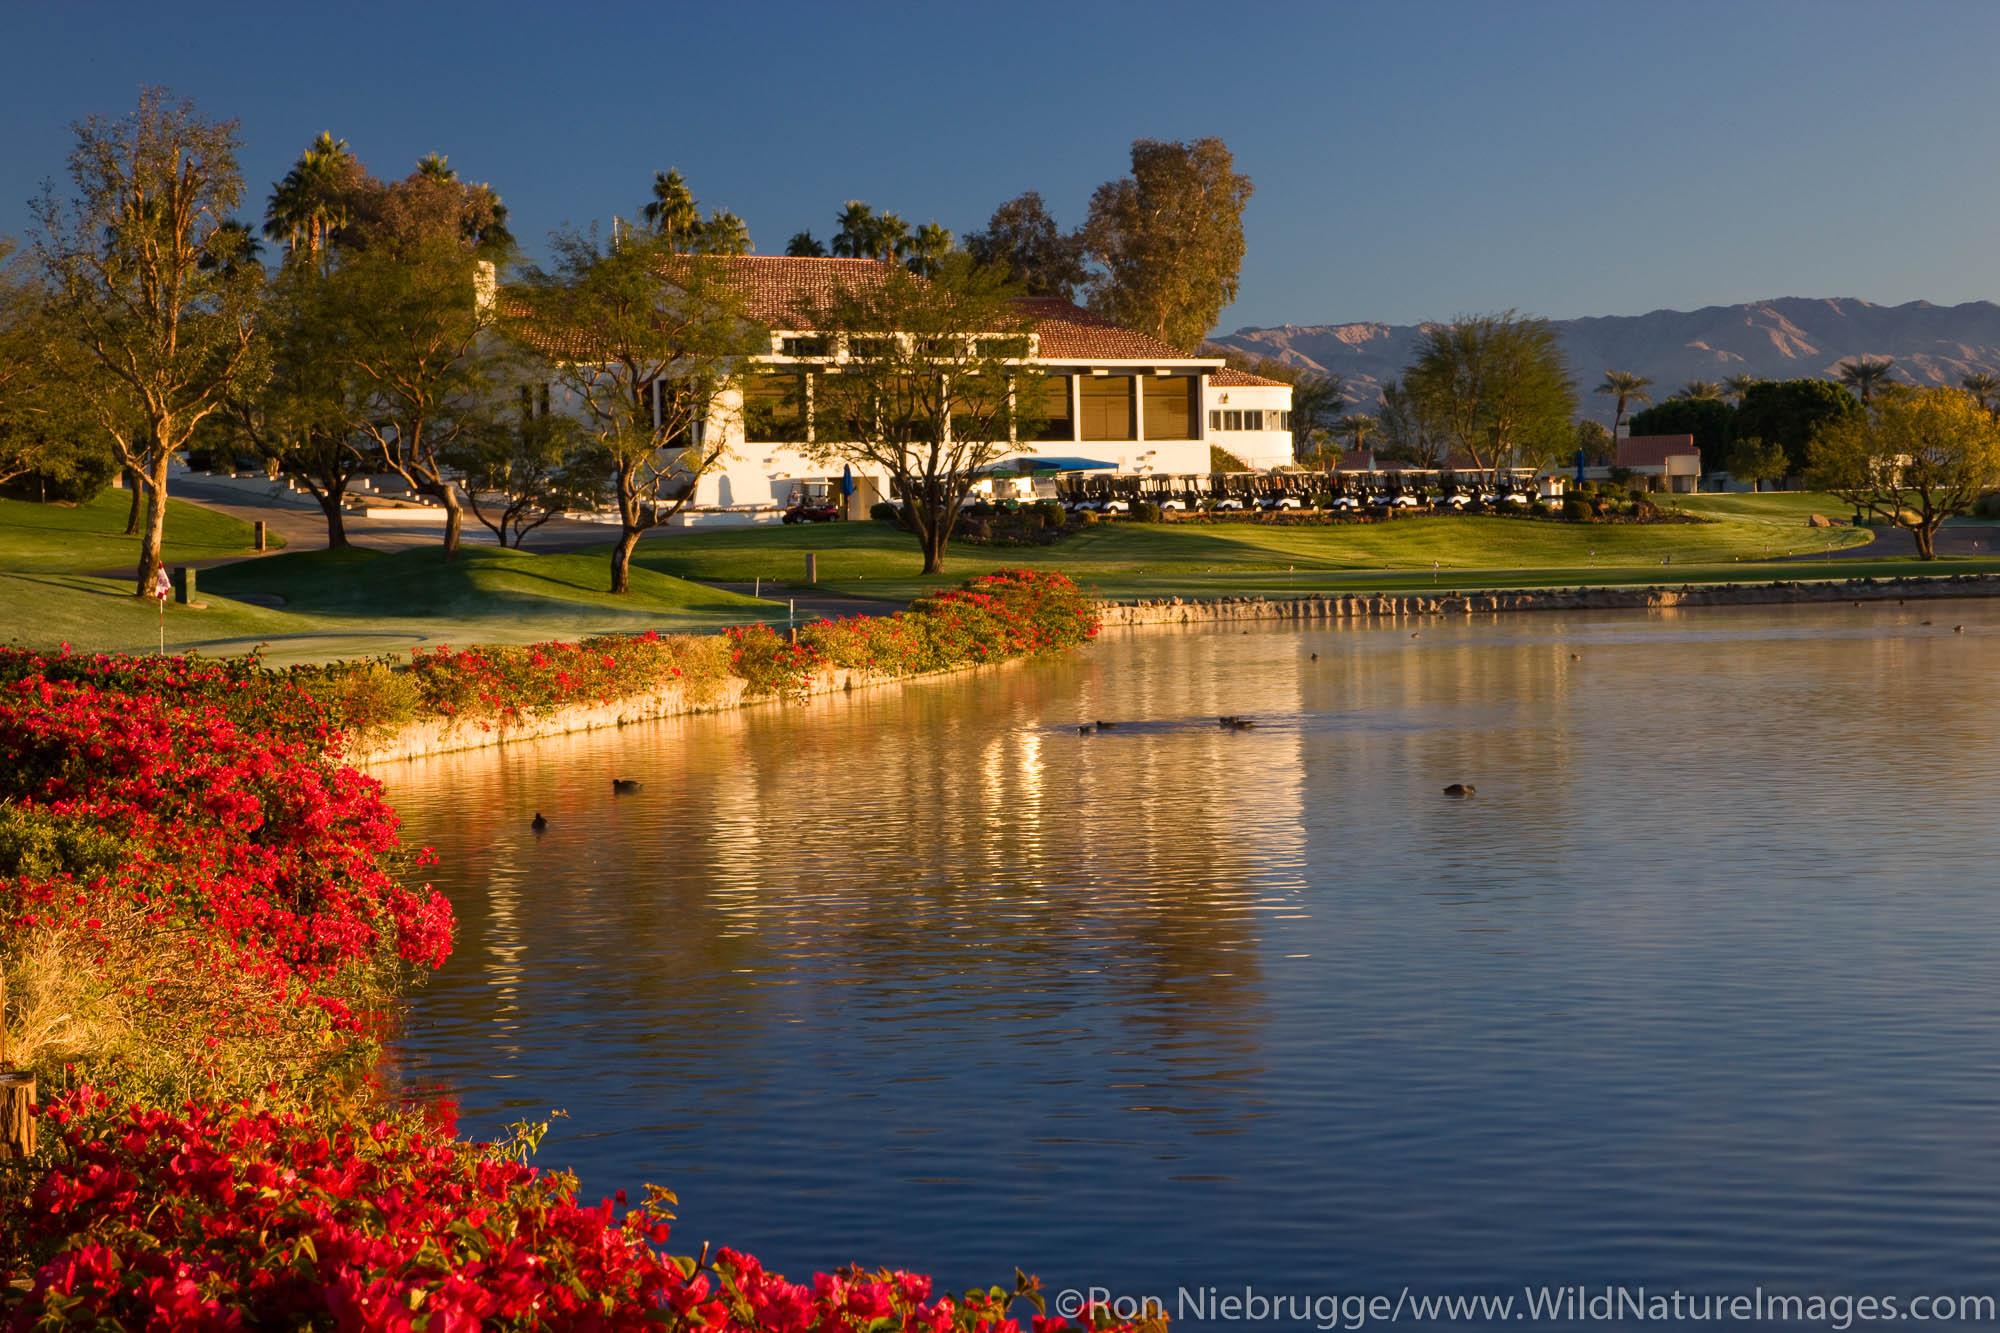 La Quinta Resort & Club in the greater Palm Springs area, La Quinta, California.